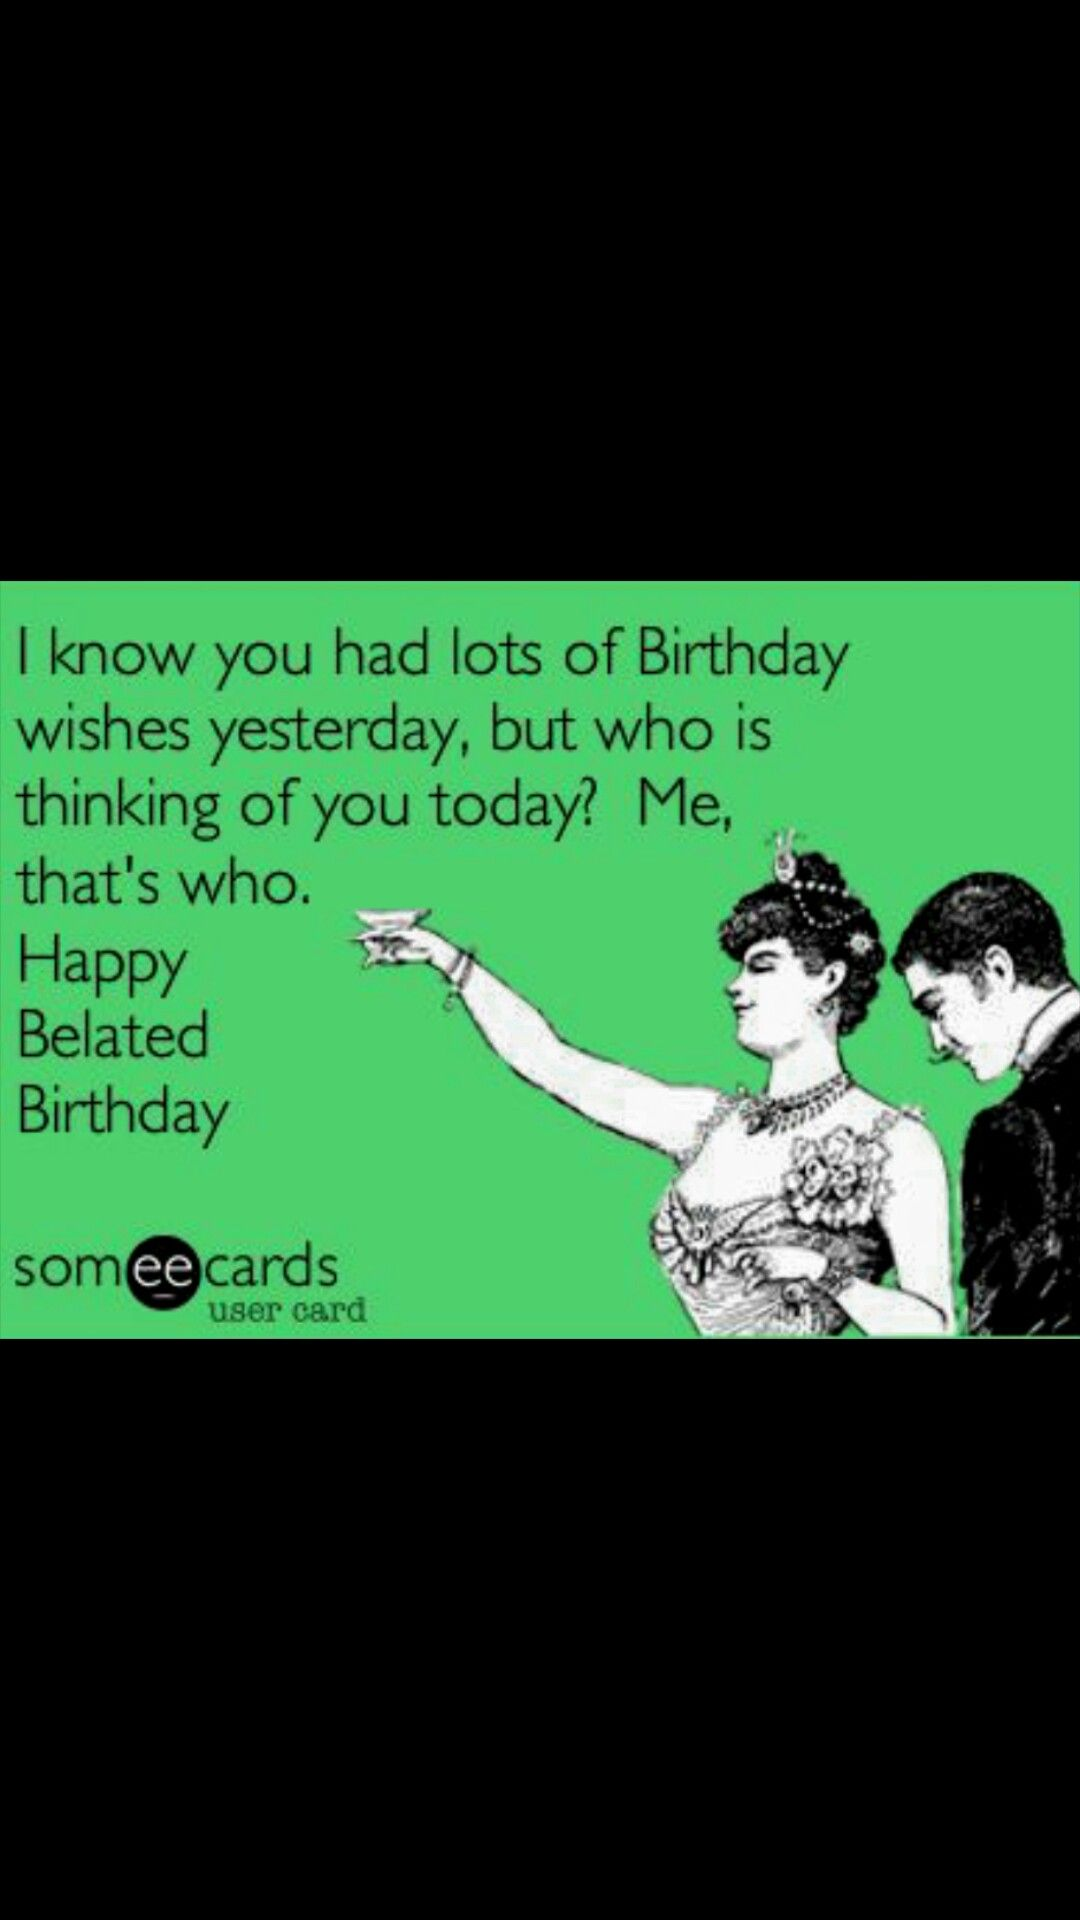 Pin By Kerry Scott On Birthdays Celebrations Funny Belated Birthday Wishes Funny Birthday Meme Belated Birthday Funny